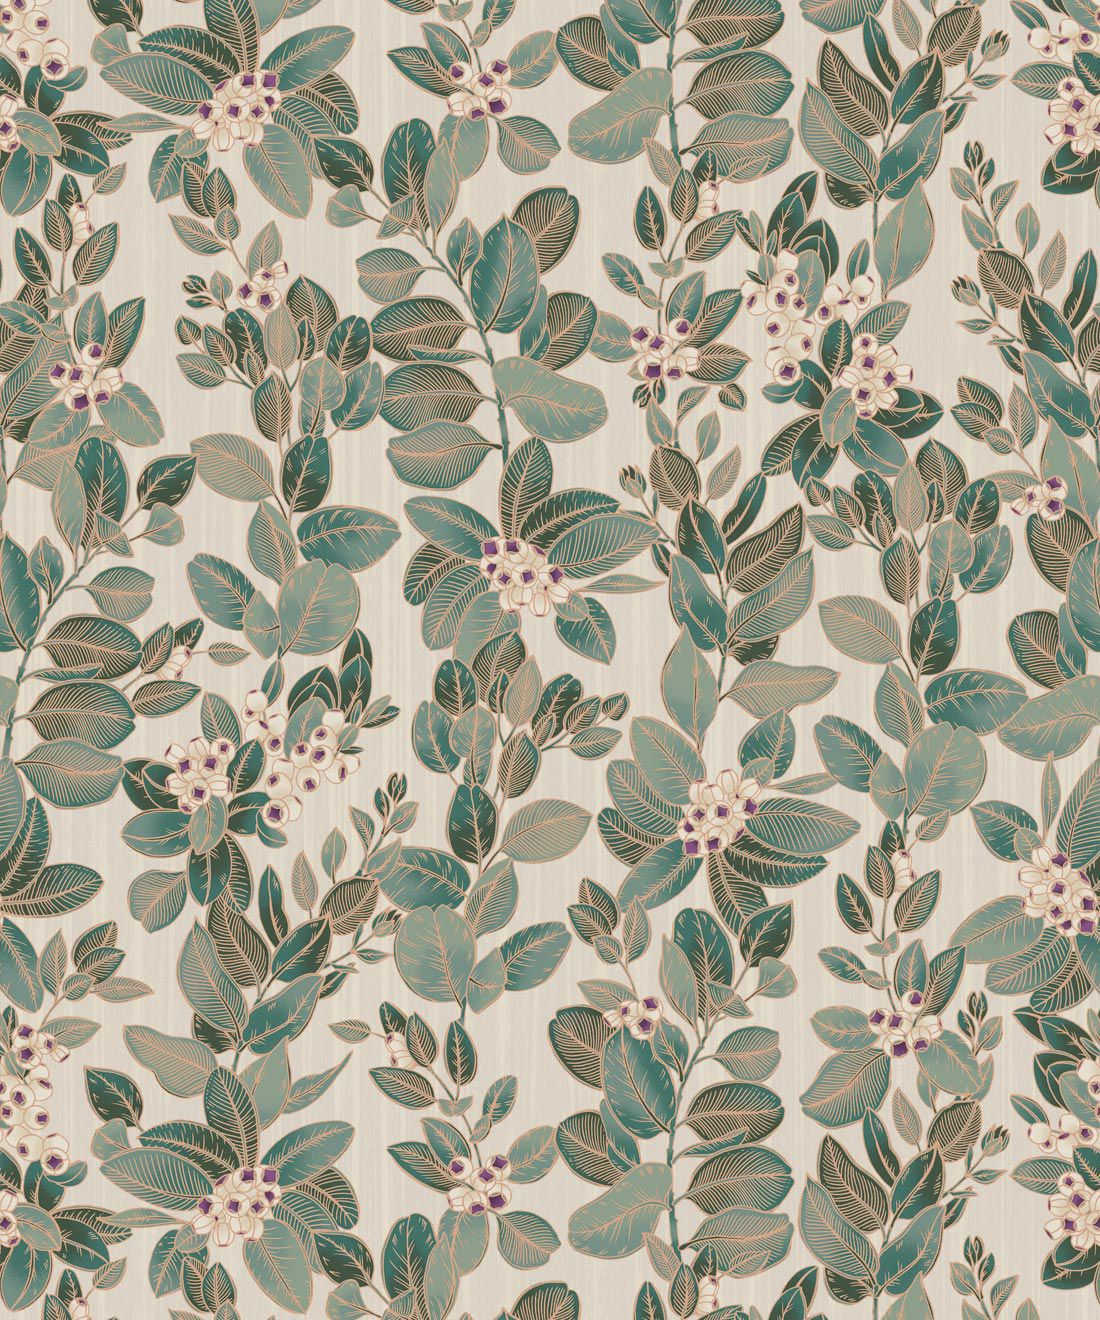 Eucalyptus Wallpaper • Eloise Short • Vintage Floral Wallpaper •Granny Chic Wallpaper • Grandmillennial Style Wallpaper •Pearl •Swatch